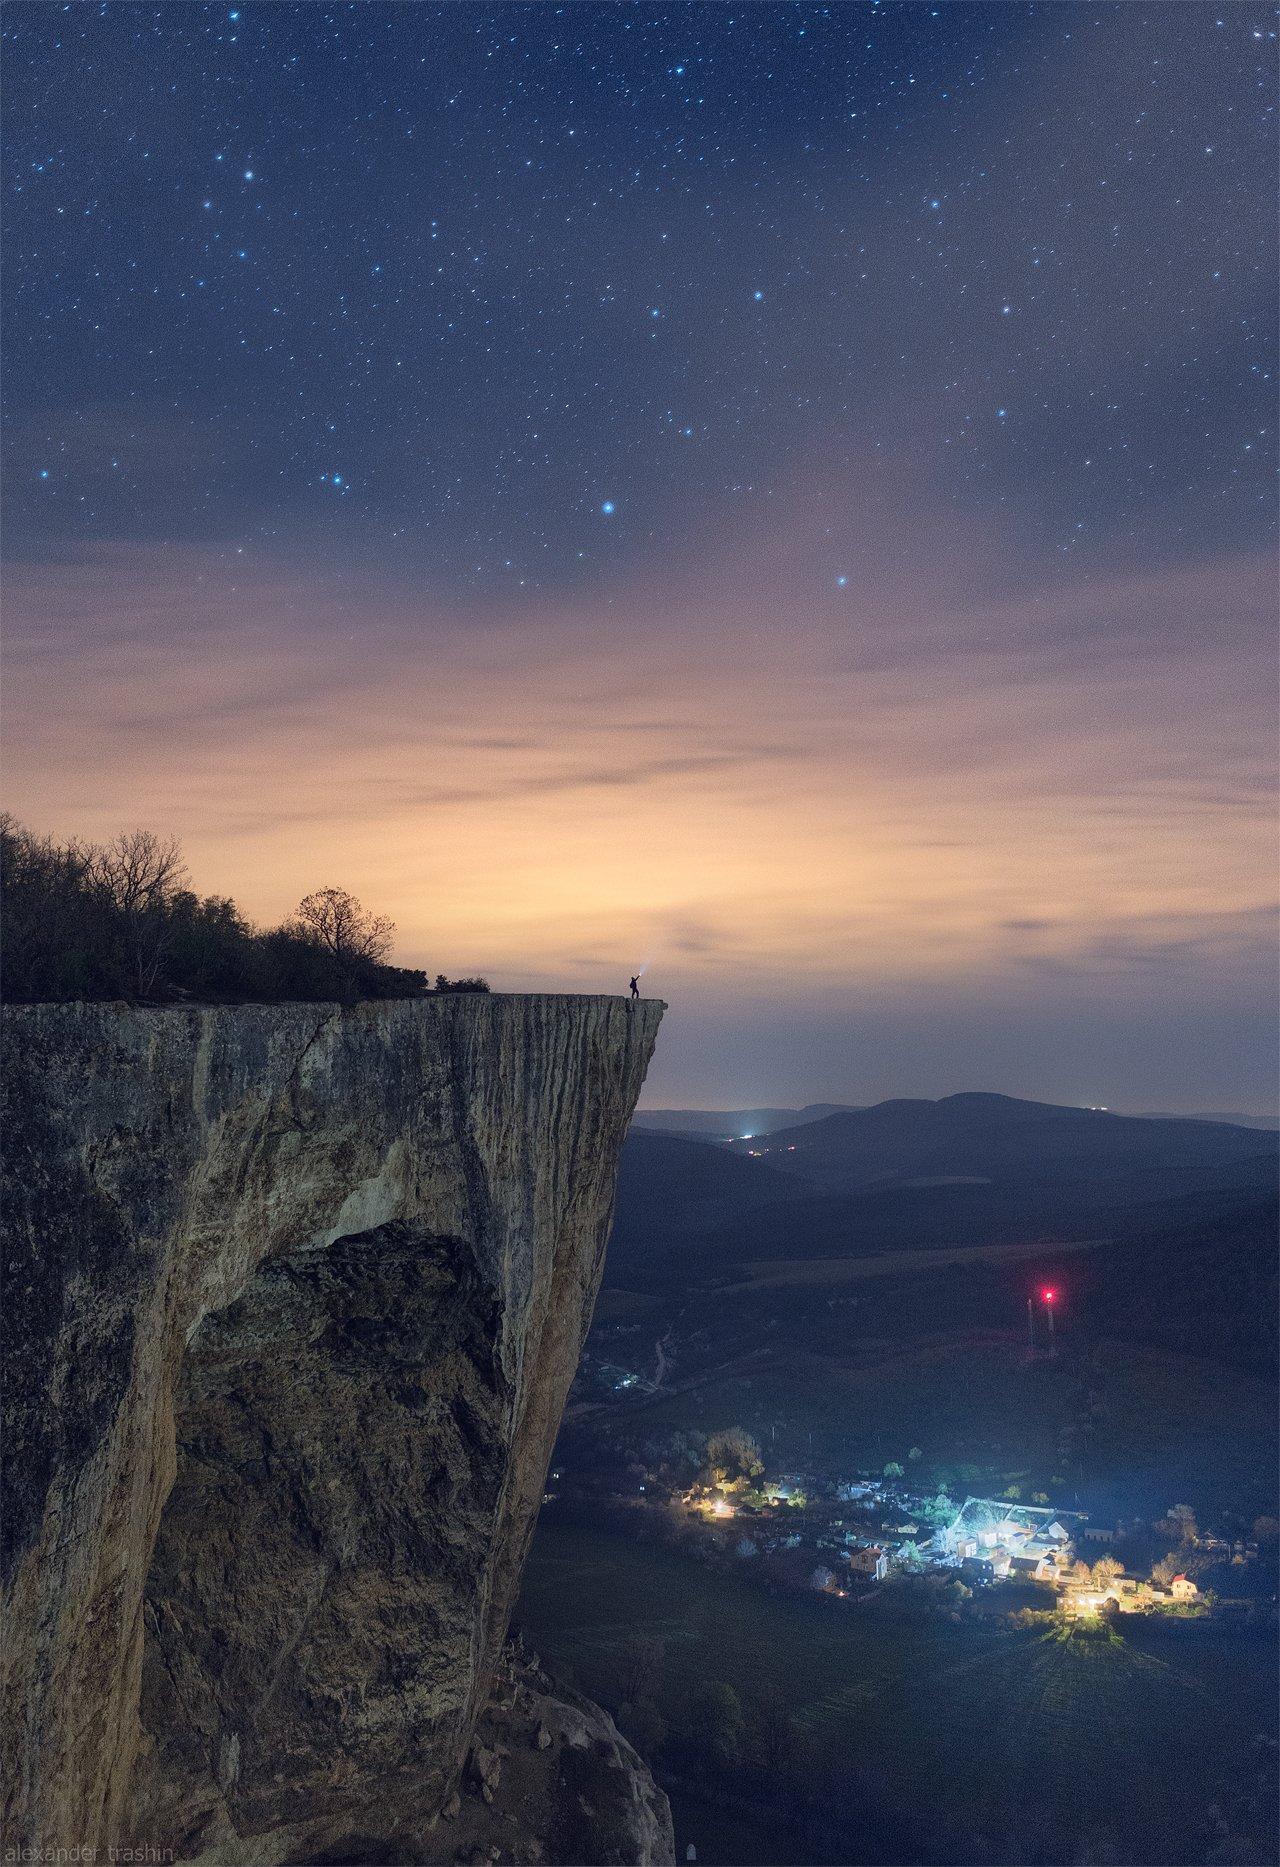 крым, баштановка, качи-кальон, пейзаж, ночной пейзаж, Александр Трашин